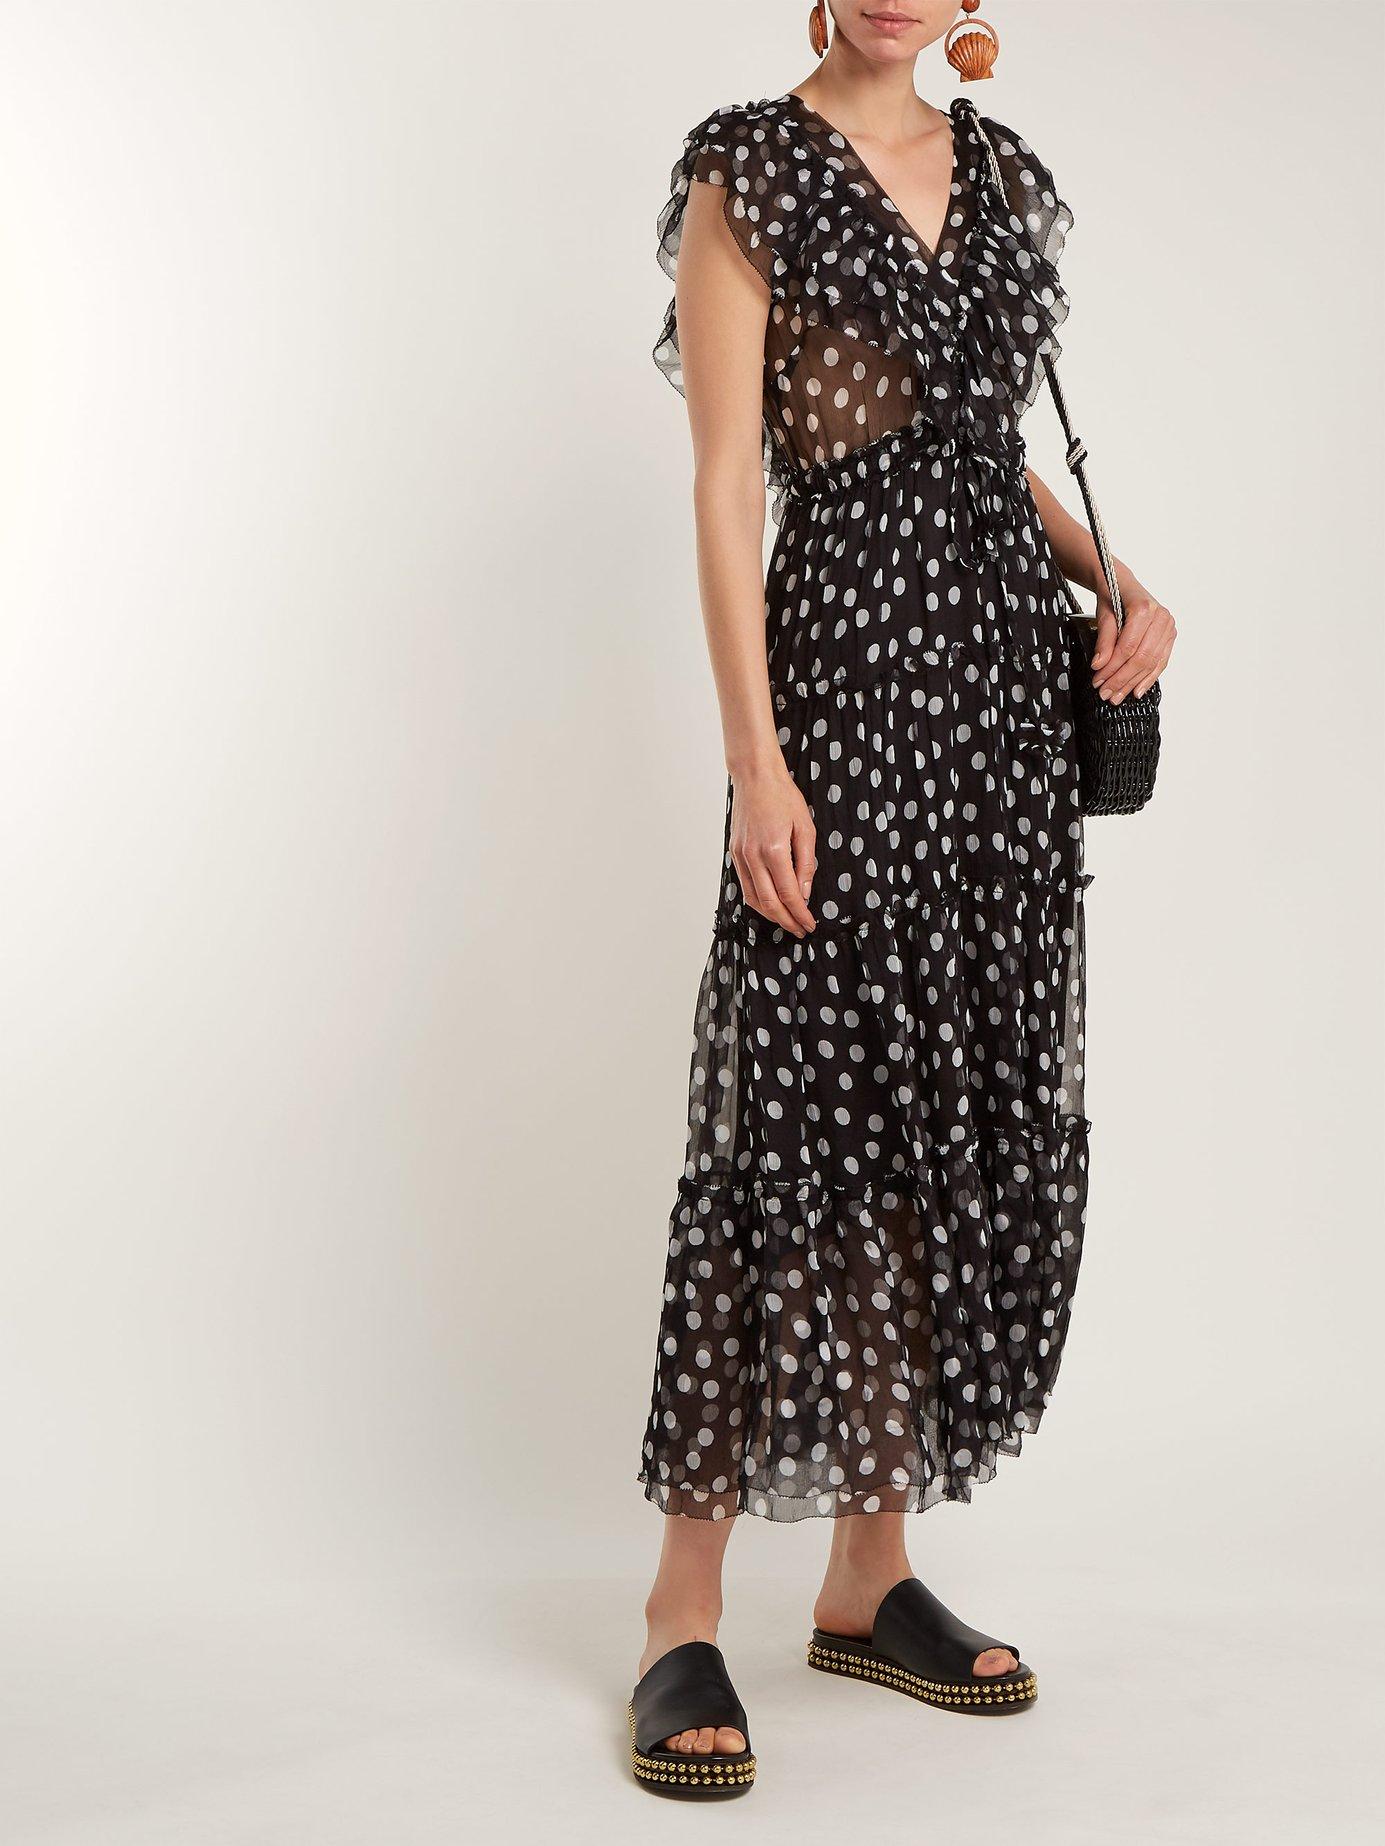 Mansfield polka-dot V-neck silk dress by Lee Mathews